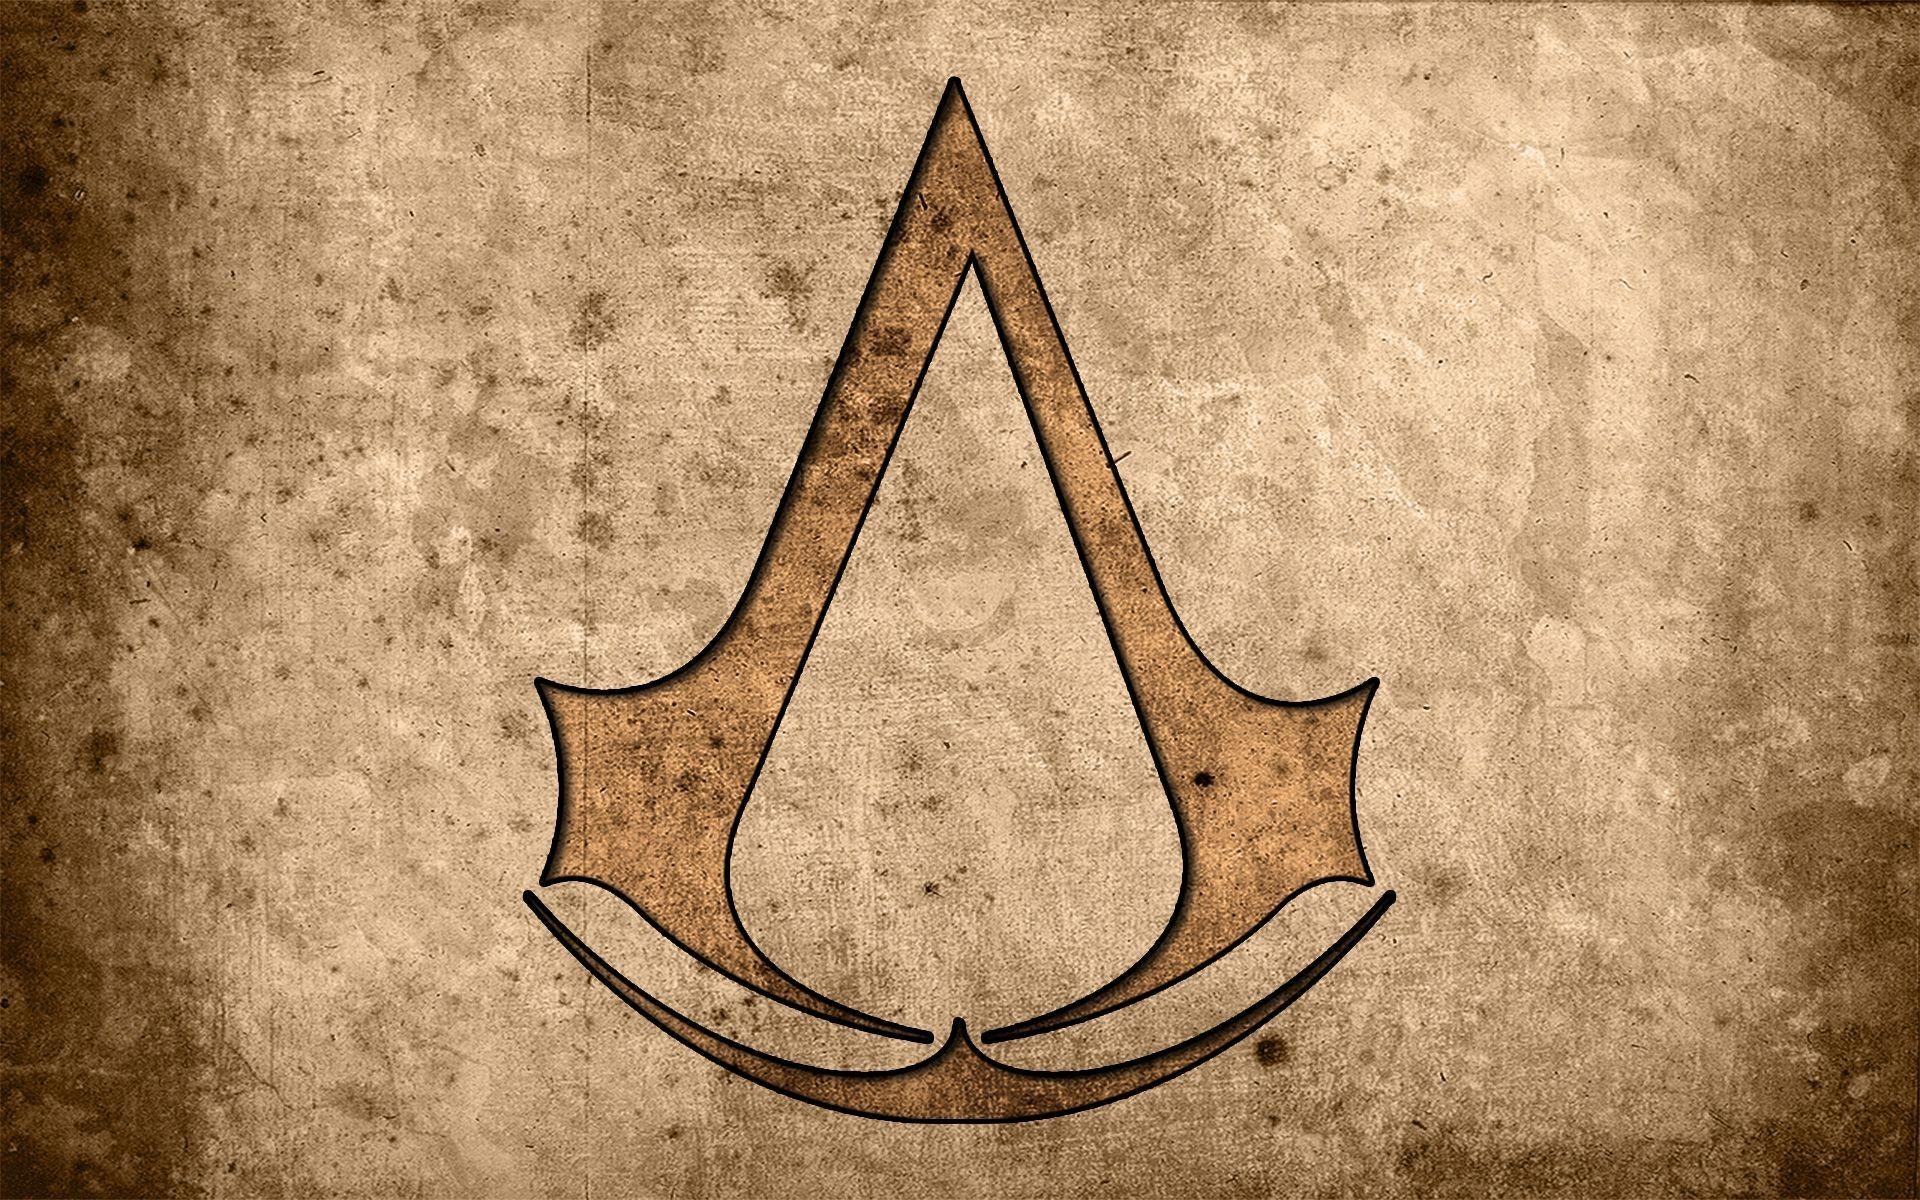 … crossover; Assassin's Creed logo